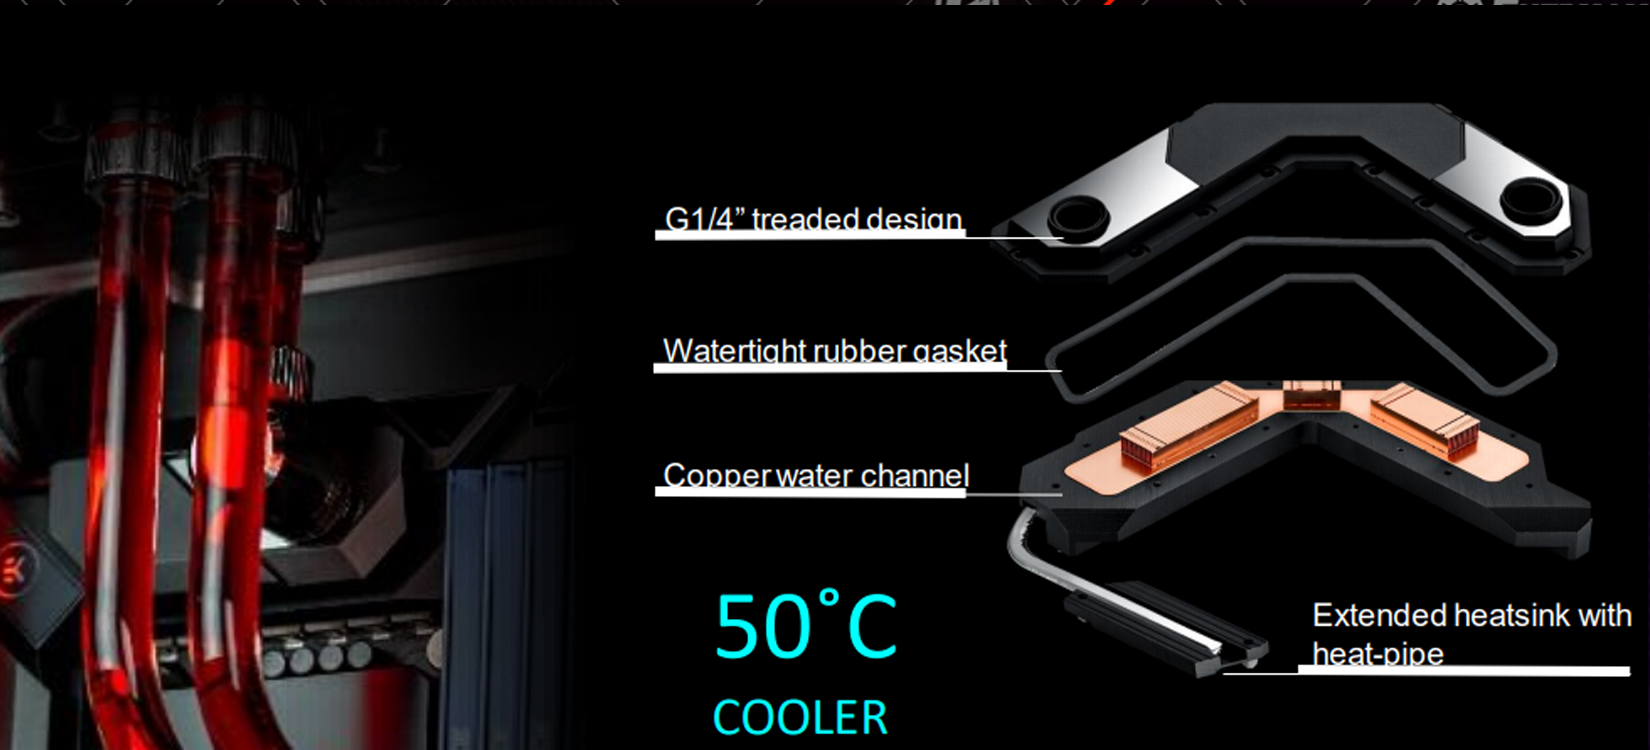 Mainboard ASUS ROG MAXIMUS XII FORMULA (Intel Z490, Socket 1200, ATX, 4 khe RAM DDR4)